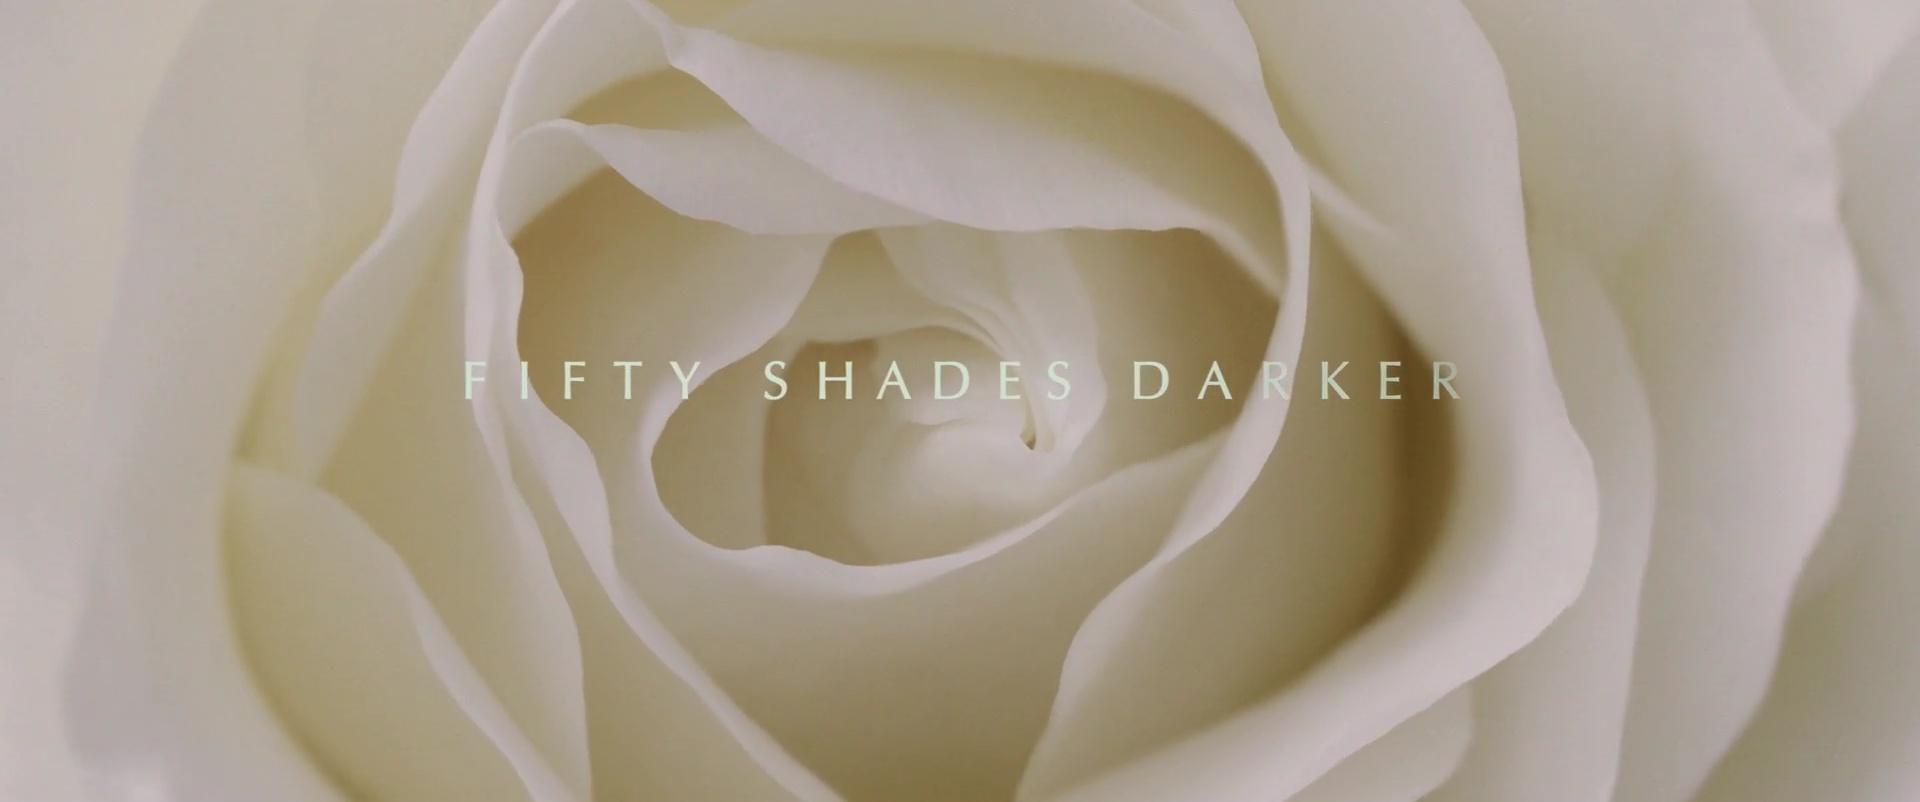 CINQUANTE NUANCES PLUS SOMBRES (Fifty Shades Darker) de James Foley (2017)